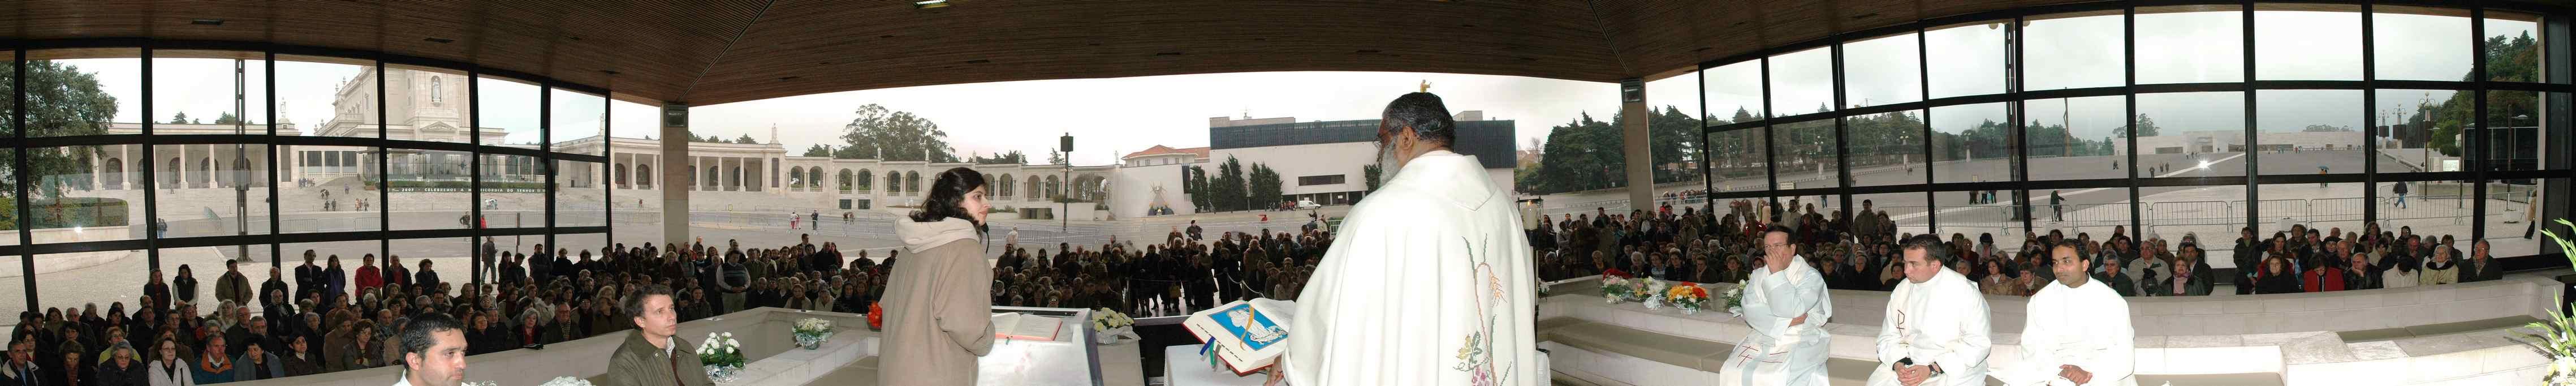 Fatima. Portugal. December 7 - 9. 2007